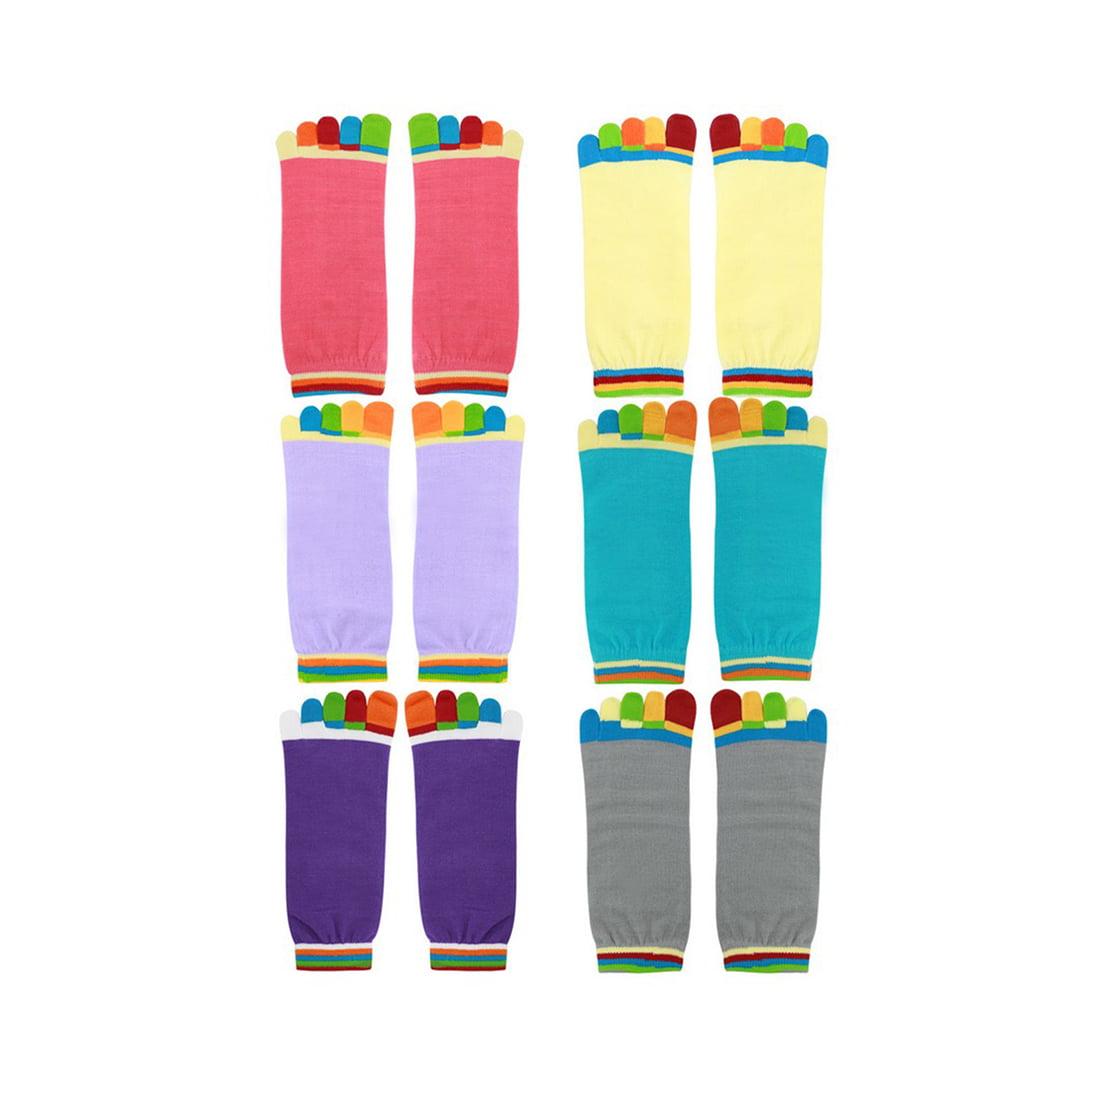 Tasharina Women's Nonslip Grips Contrast Color Toe Socks 6 Pairs Assorted Color